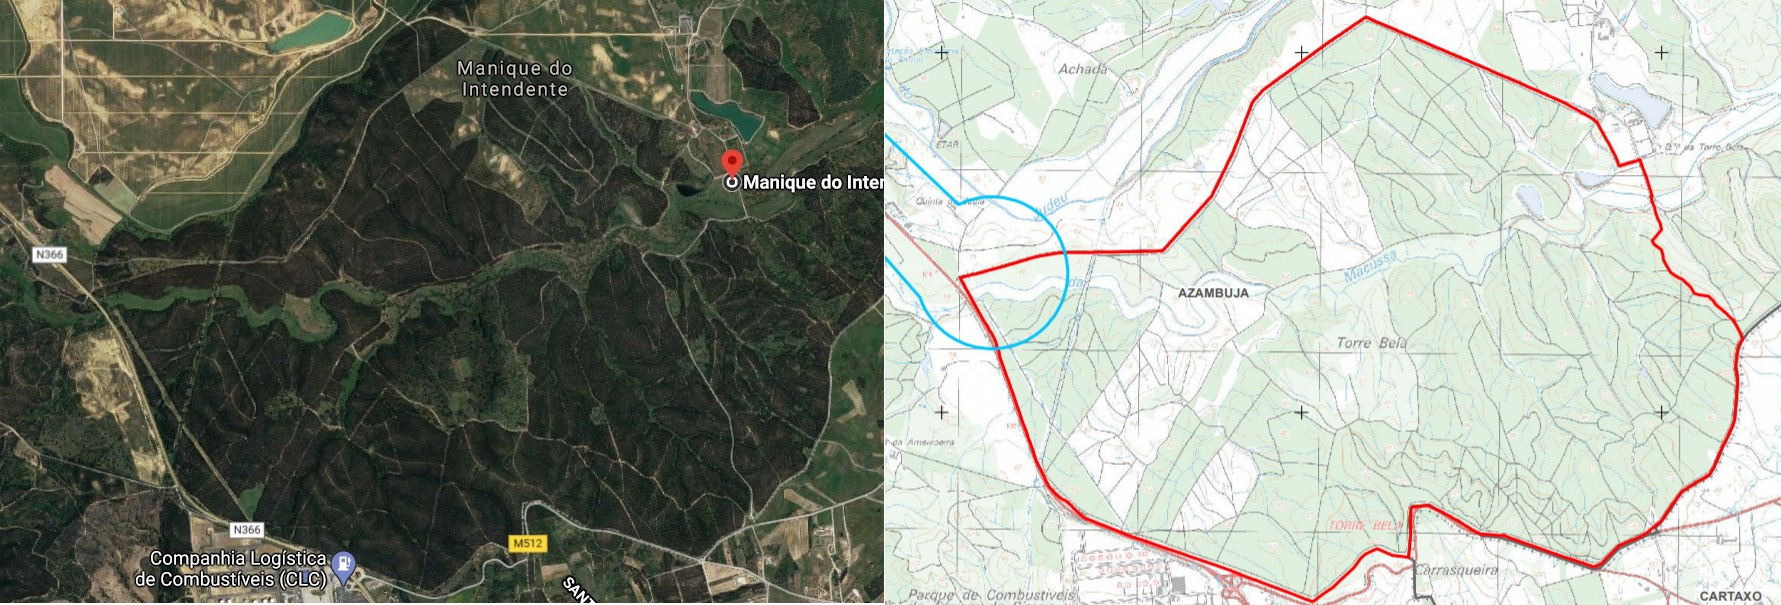 Google Maps/Participa